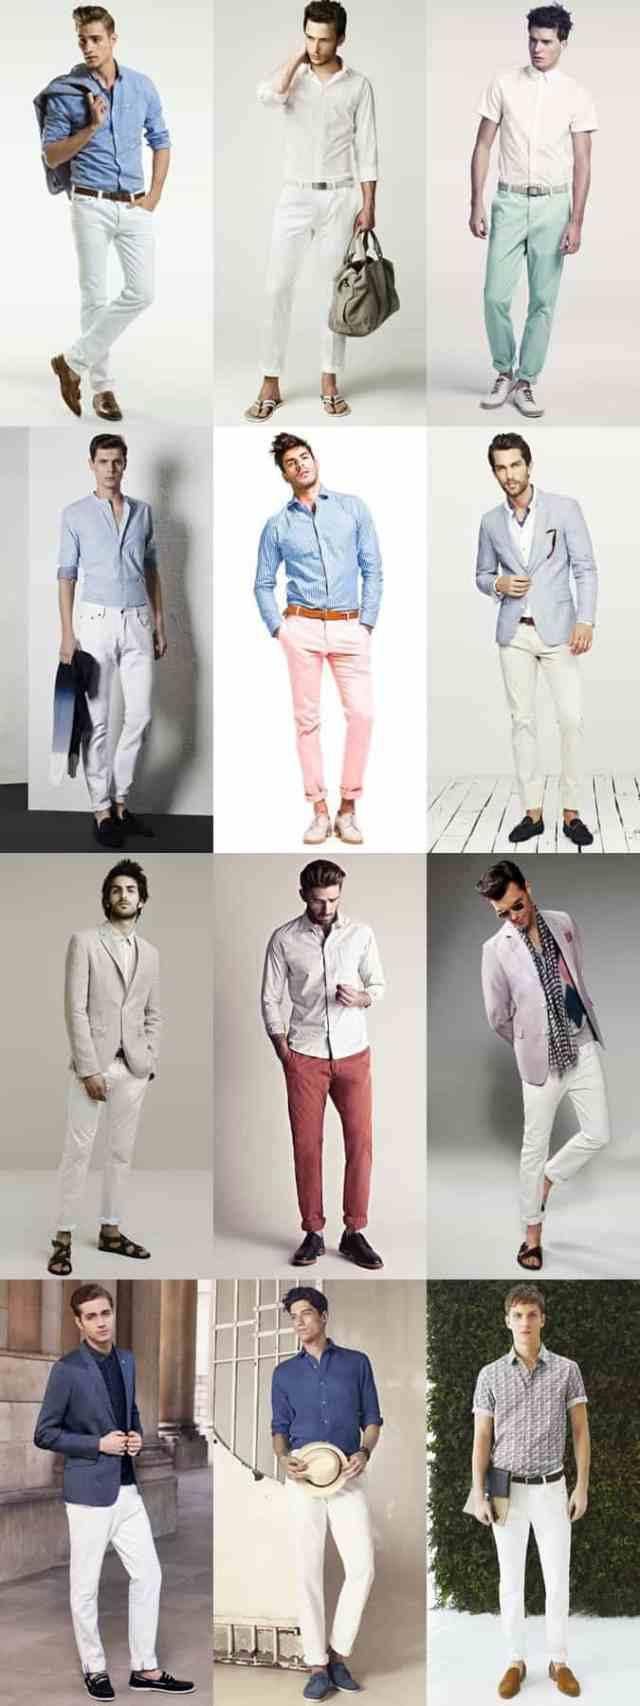 598d8d65ce8 Men s Summer Wedding Abroad Outfit Inspiration Lookbook